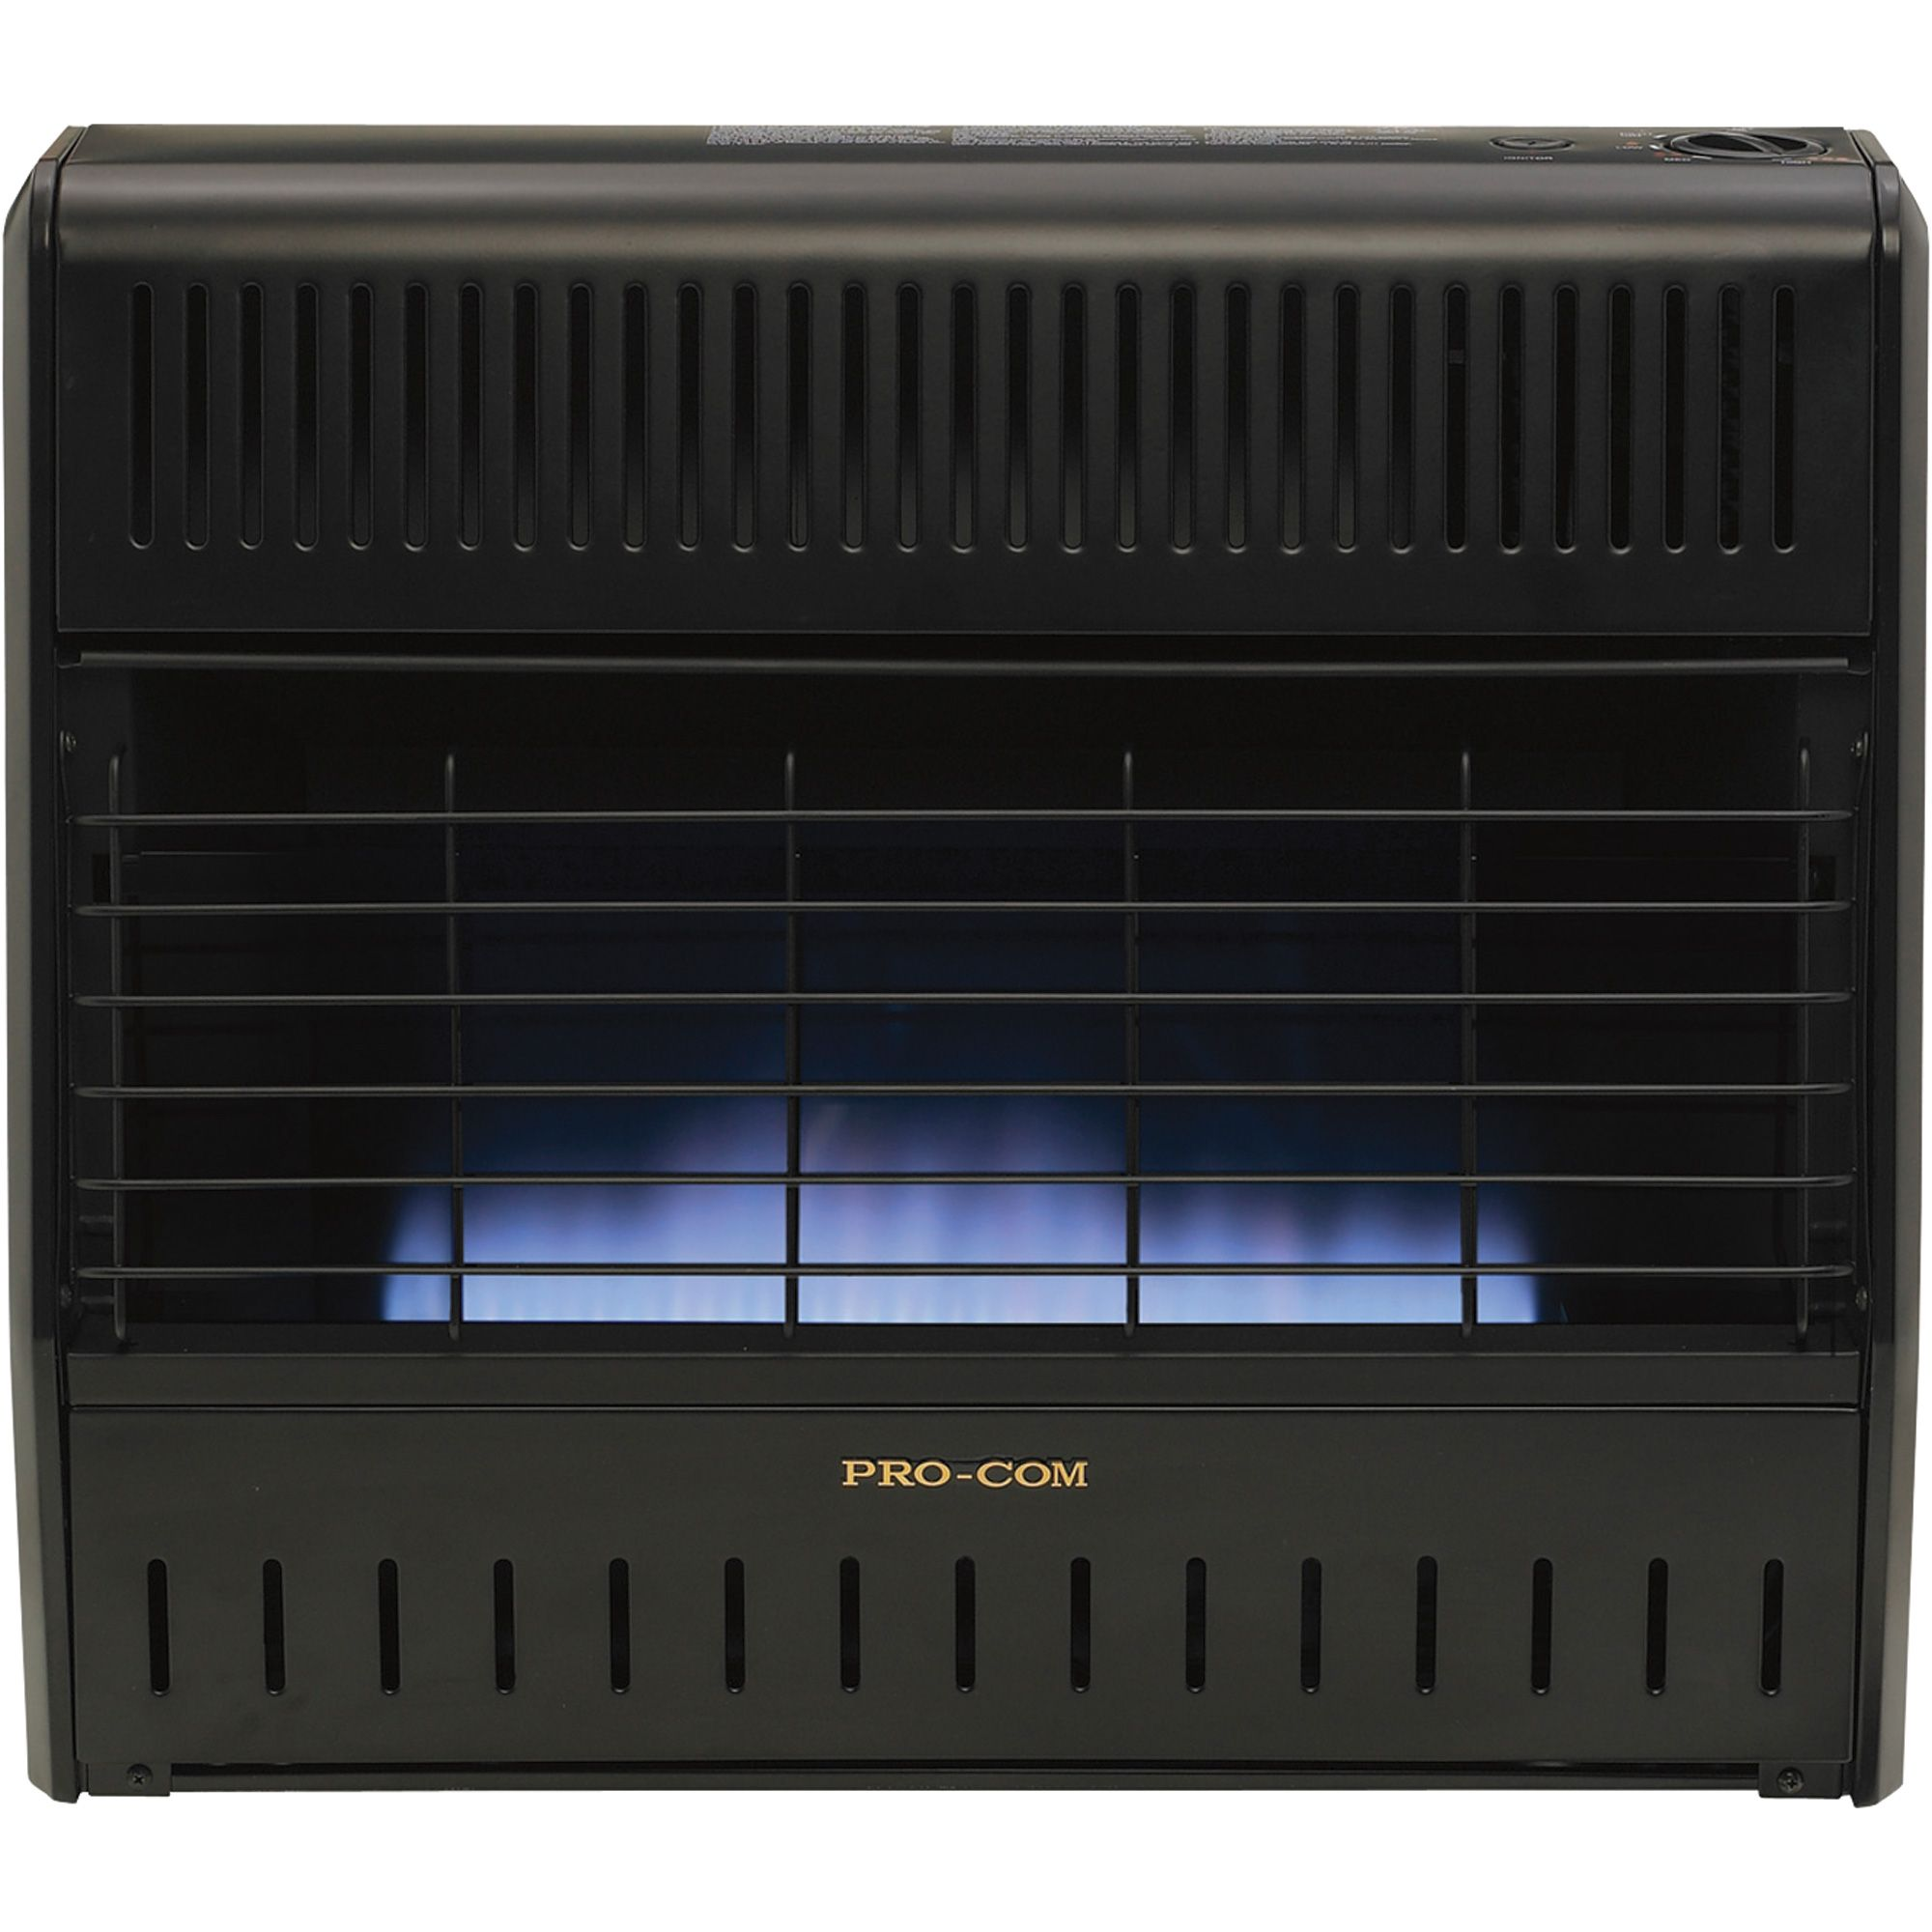 Procom Dual Fuel Vent Free Blue Flame Garage Heater